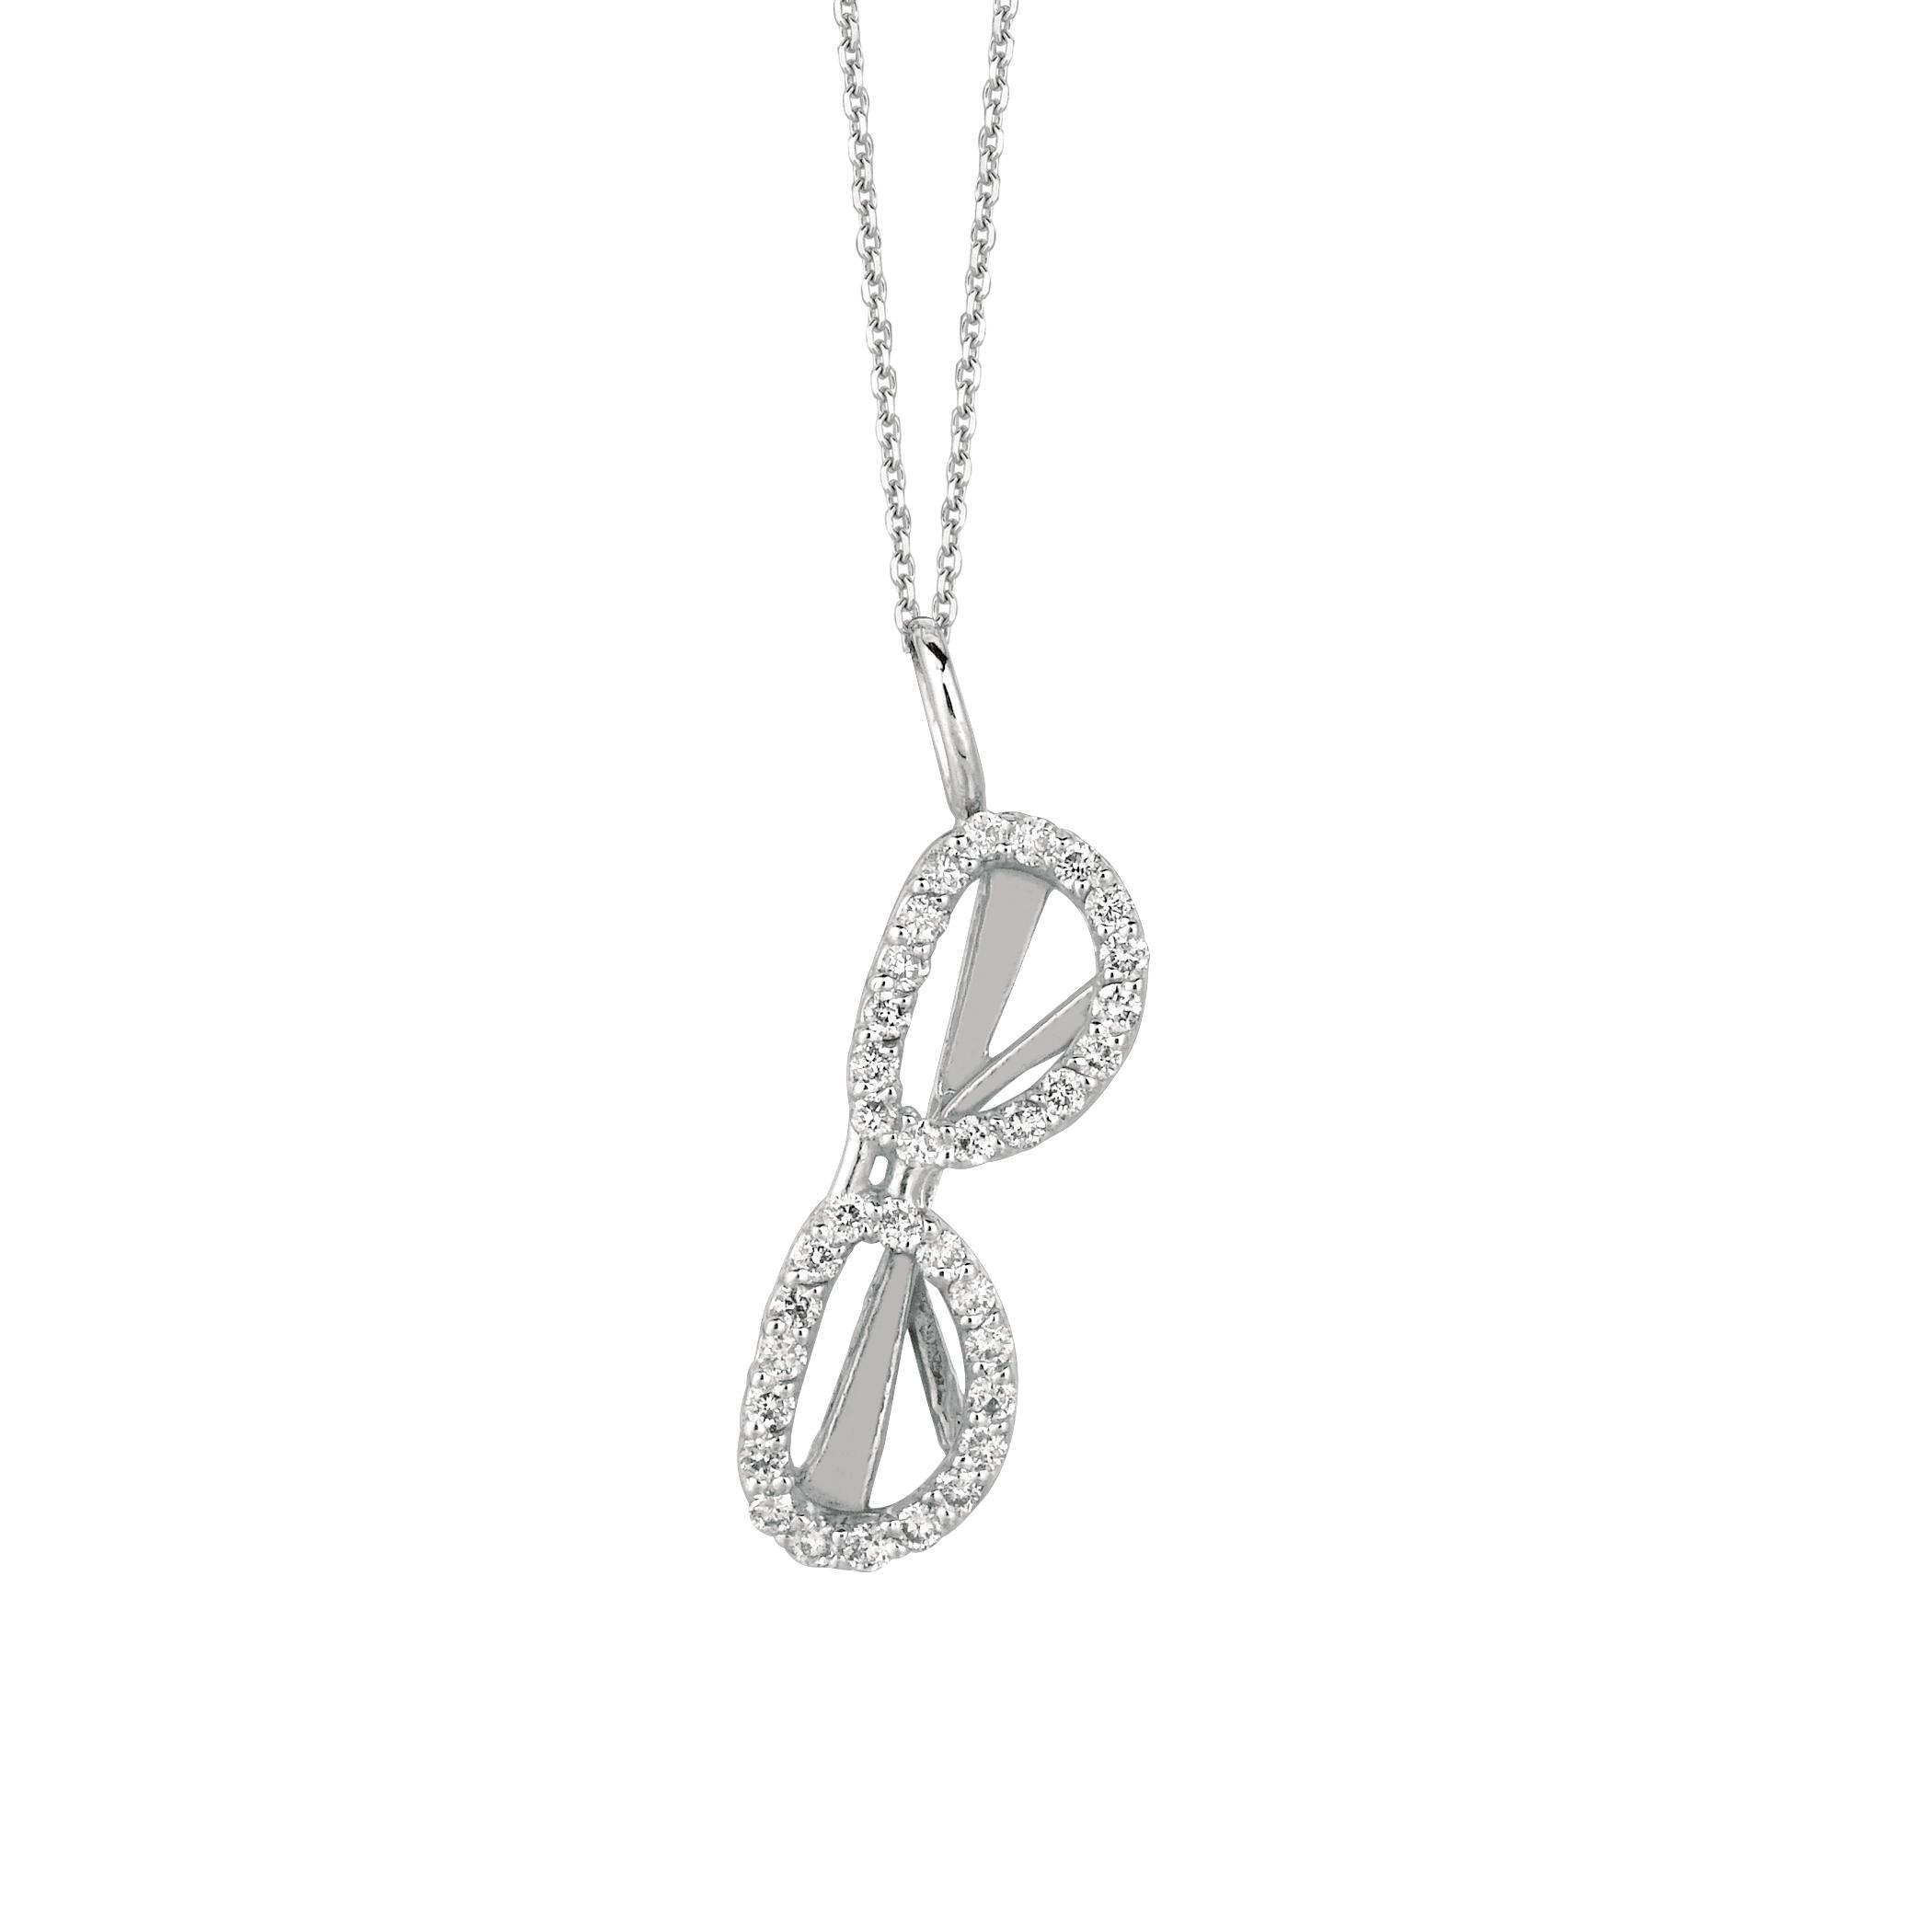 0 25 Ct Diamond Sunglass Necklace Set In 14k White Gold Idjn Wd